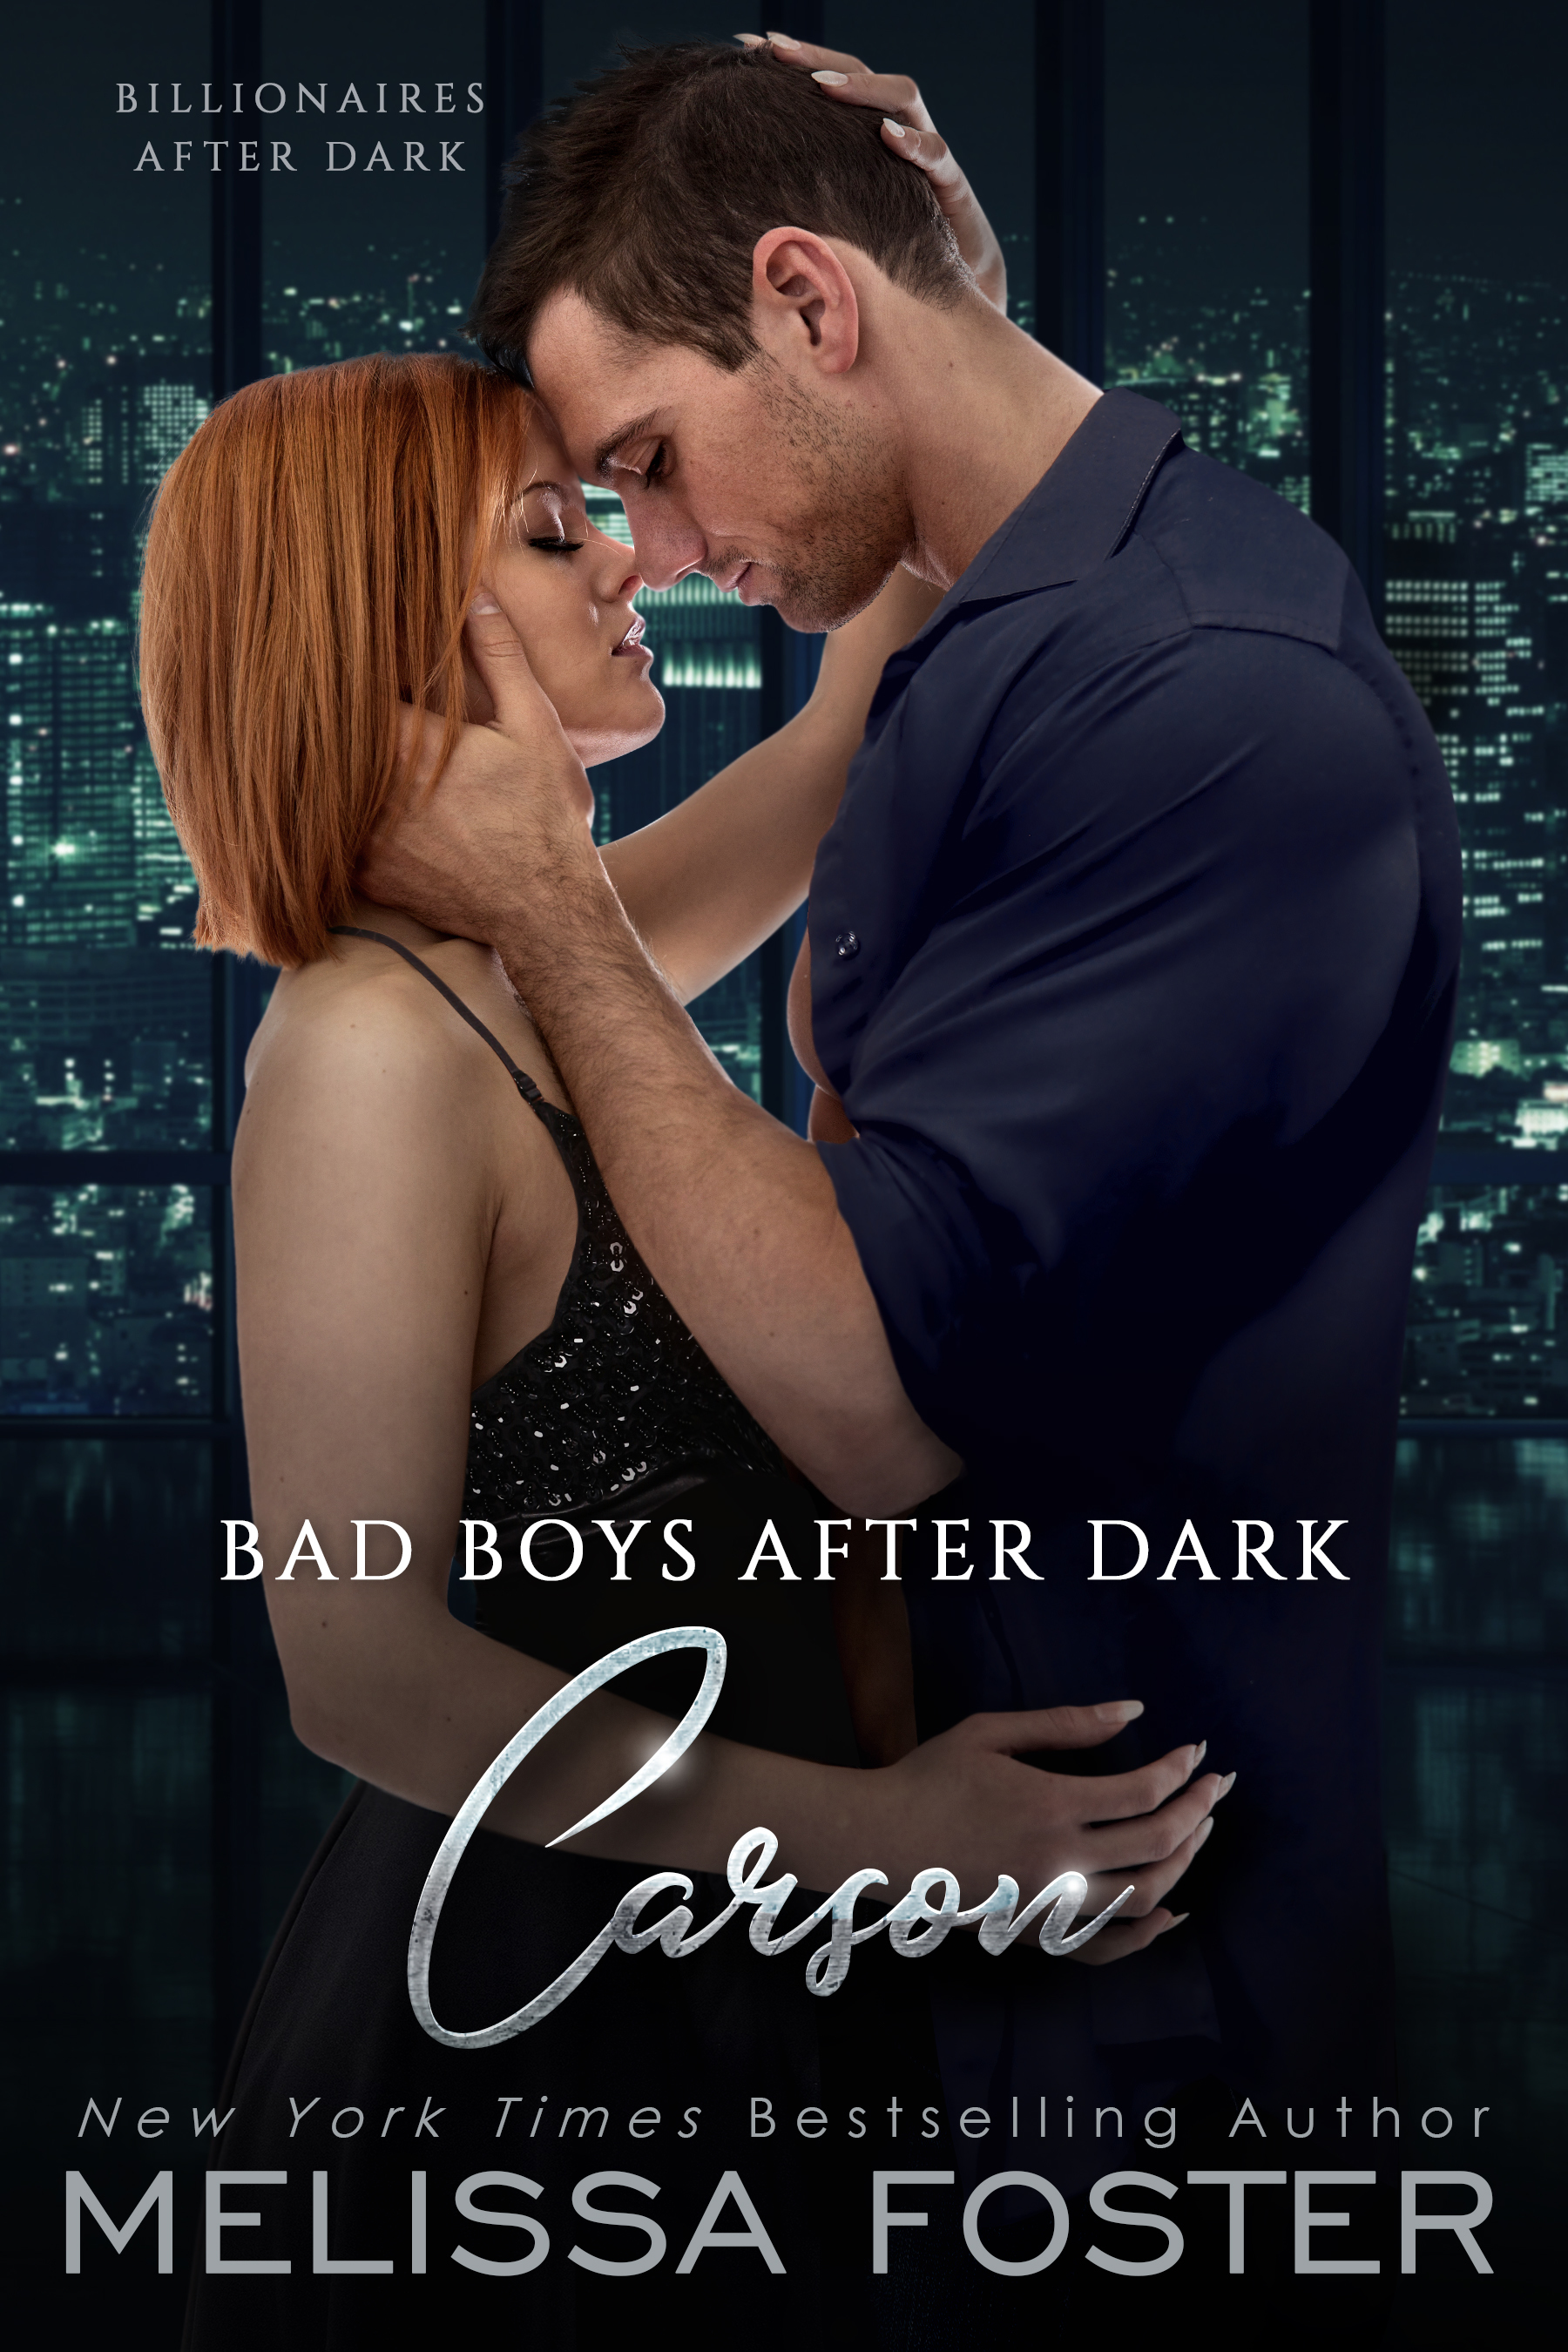 Bad Boys After Dark: Carson (Bad Billionaires After Dark #3)